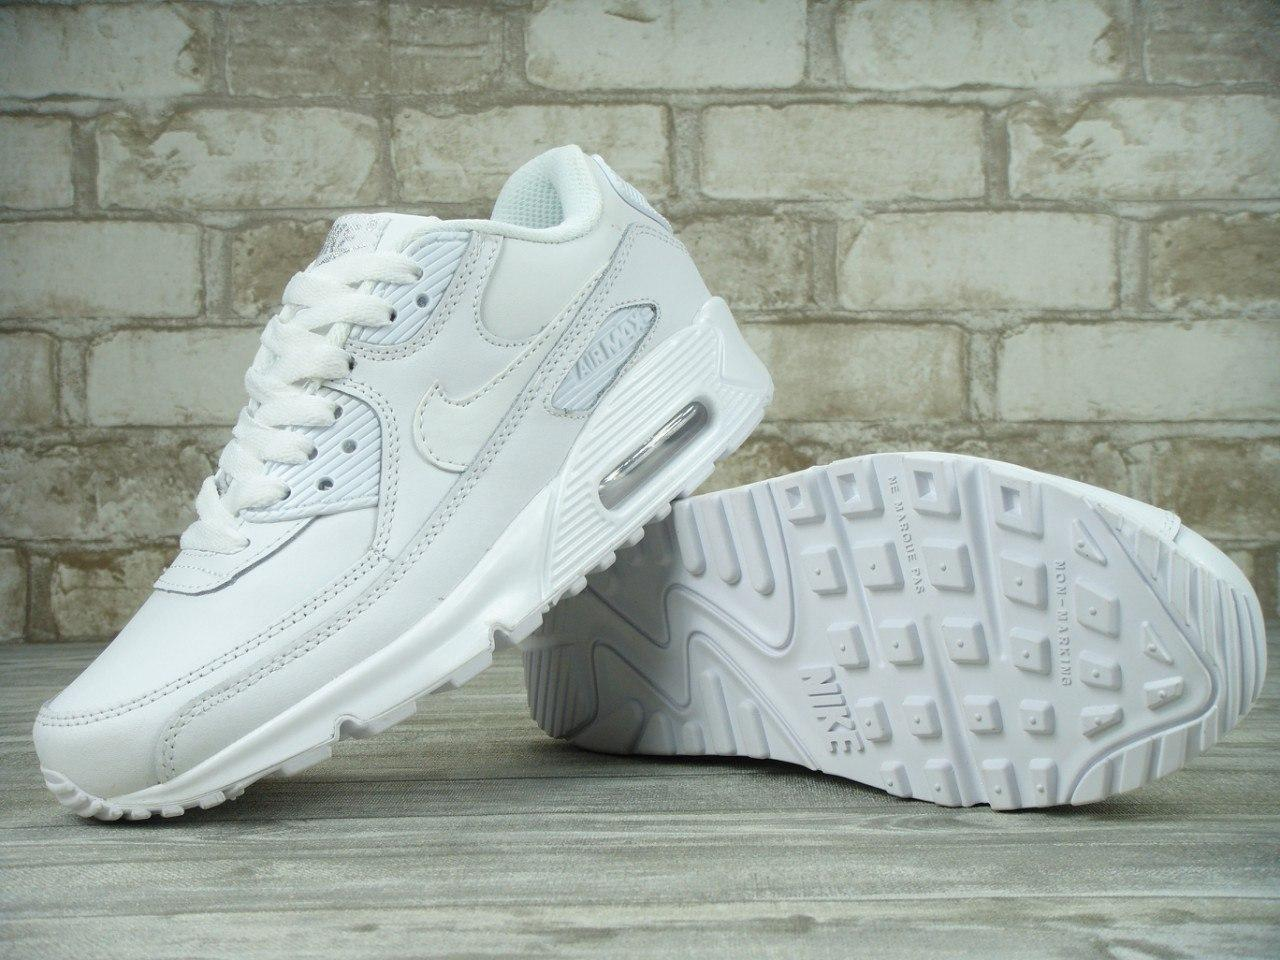 c290a978 Мужские кроссовки Nike Air Max 90 White 41, цена 1 490 грн., купить в Киеве  — Prom.ua (ID#859593036)